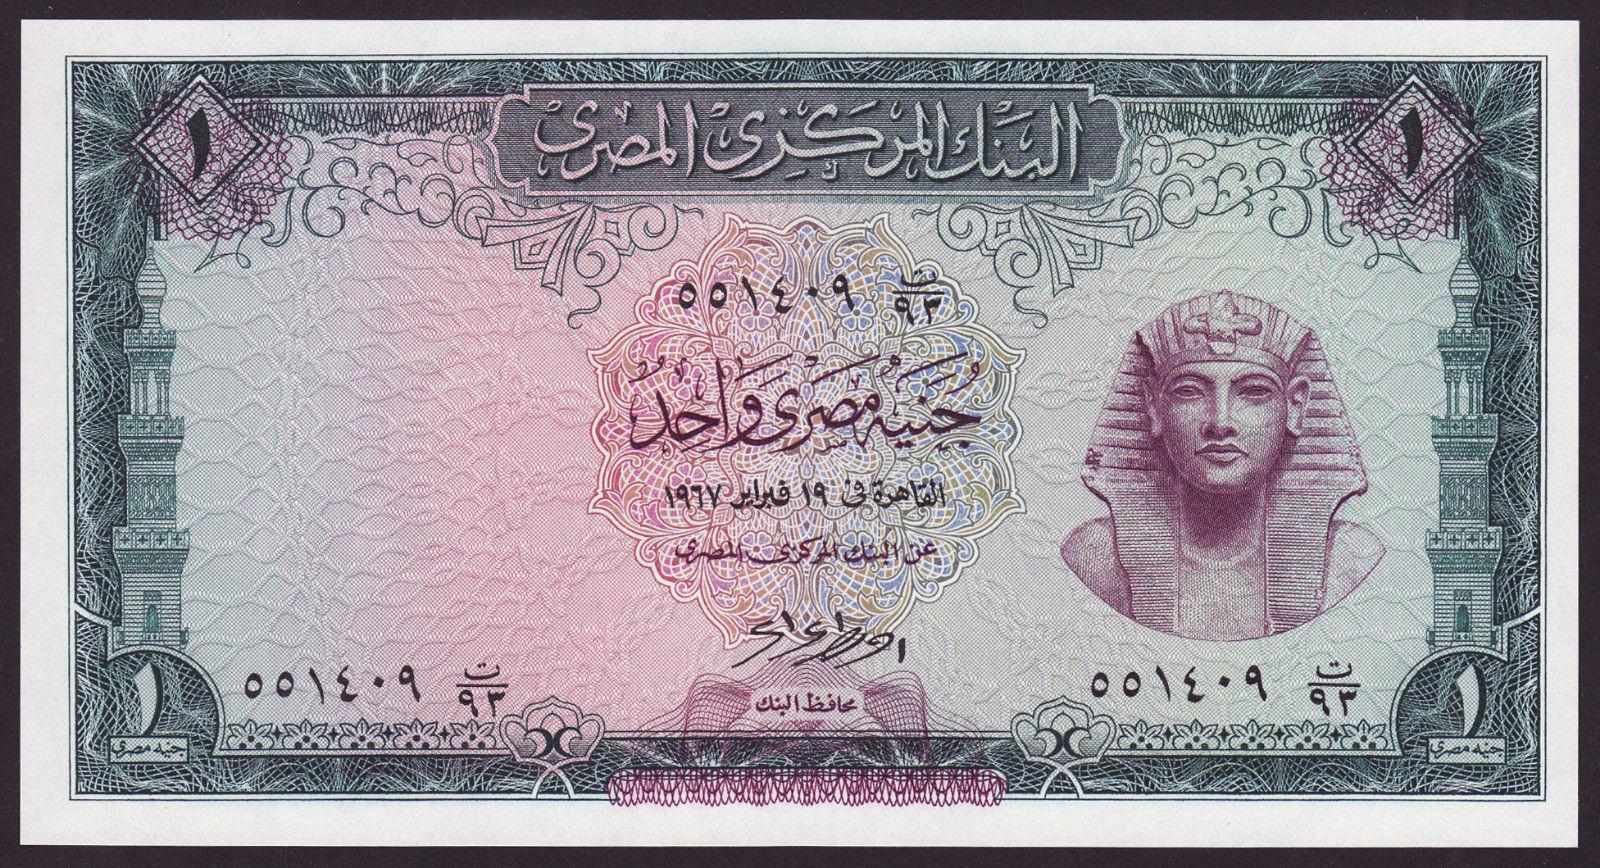 Egypt 1 Pound Banknote 1967 Pharaoh Tutankhamun World